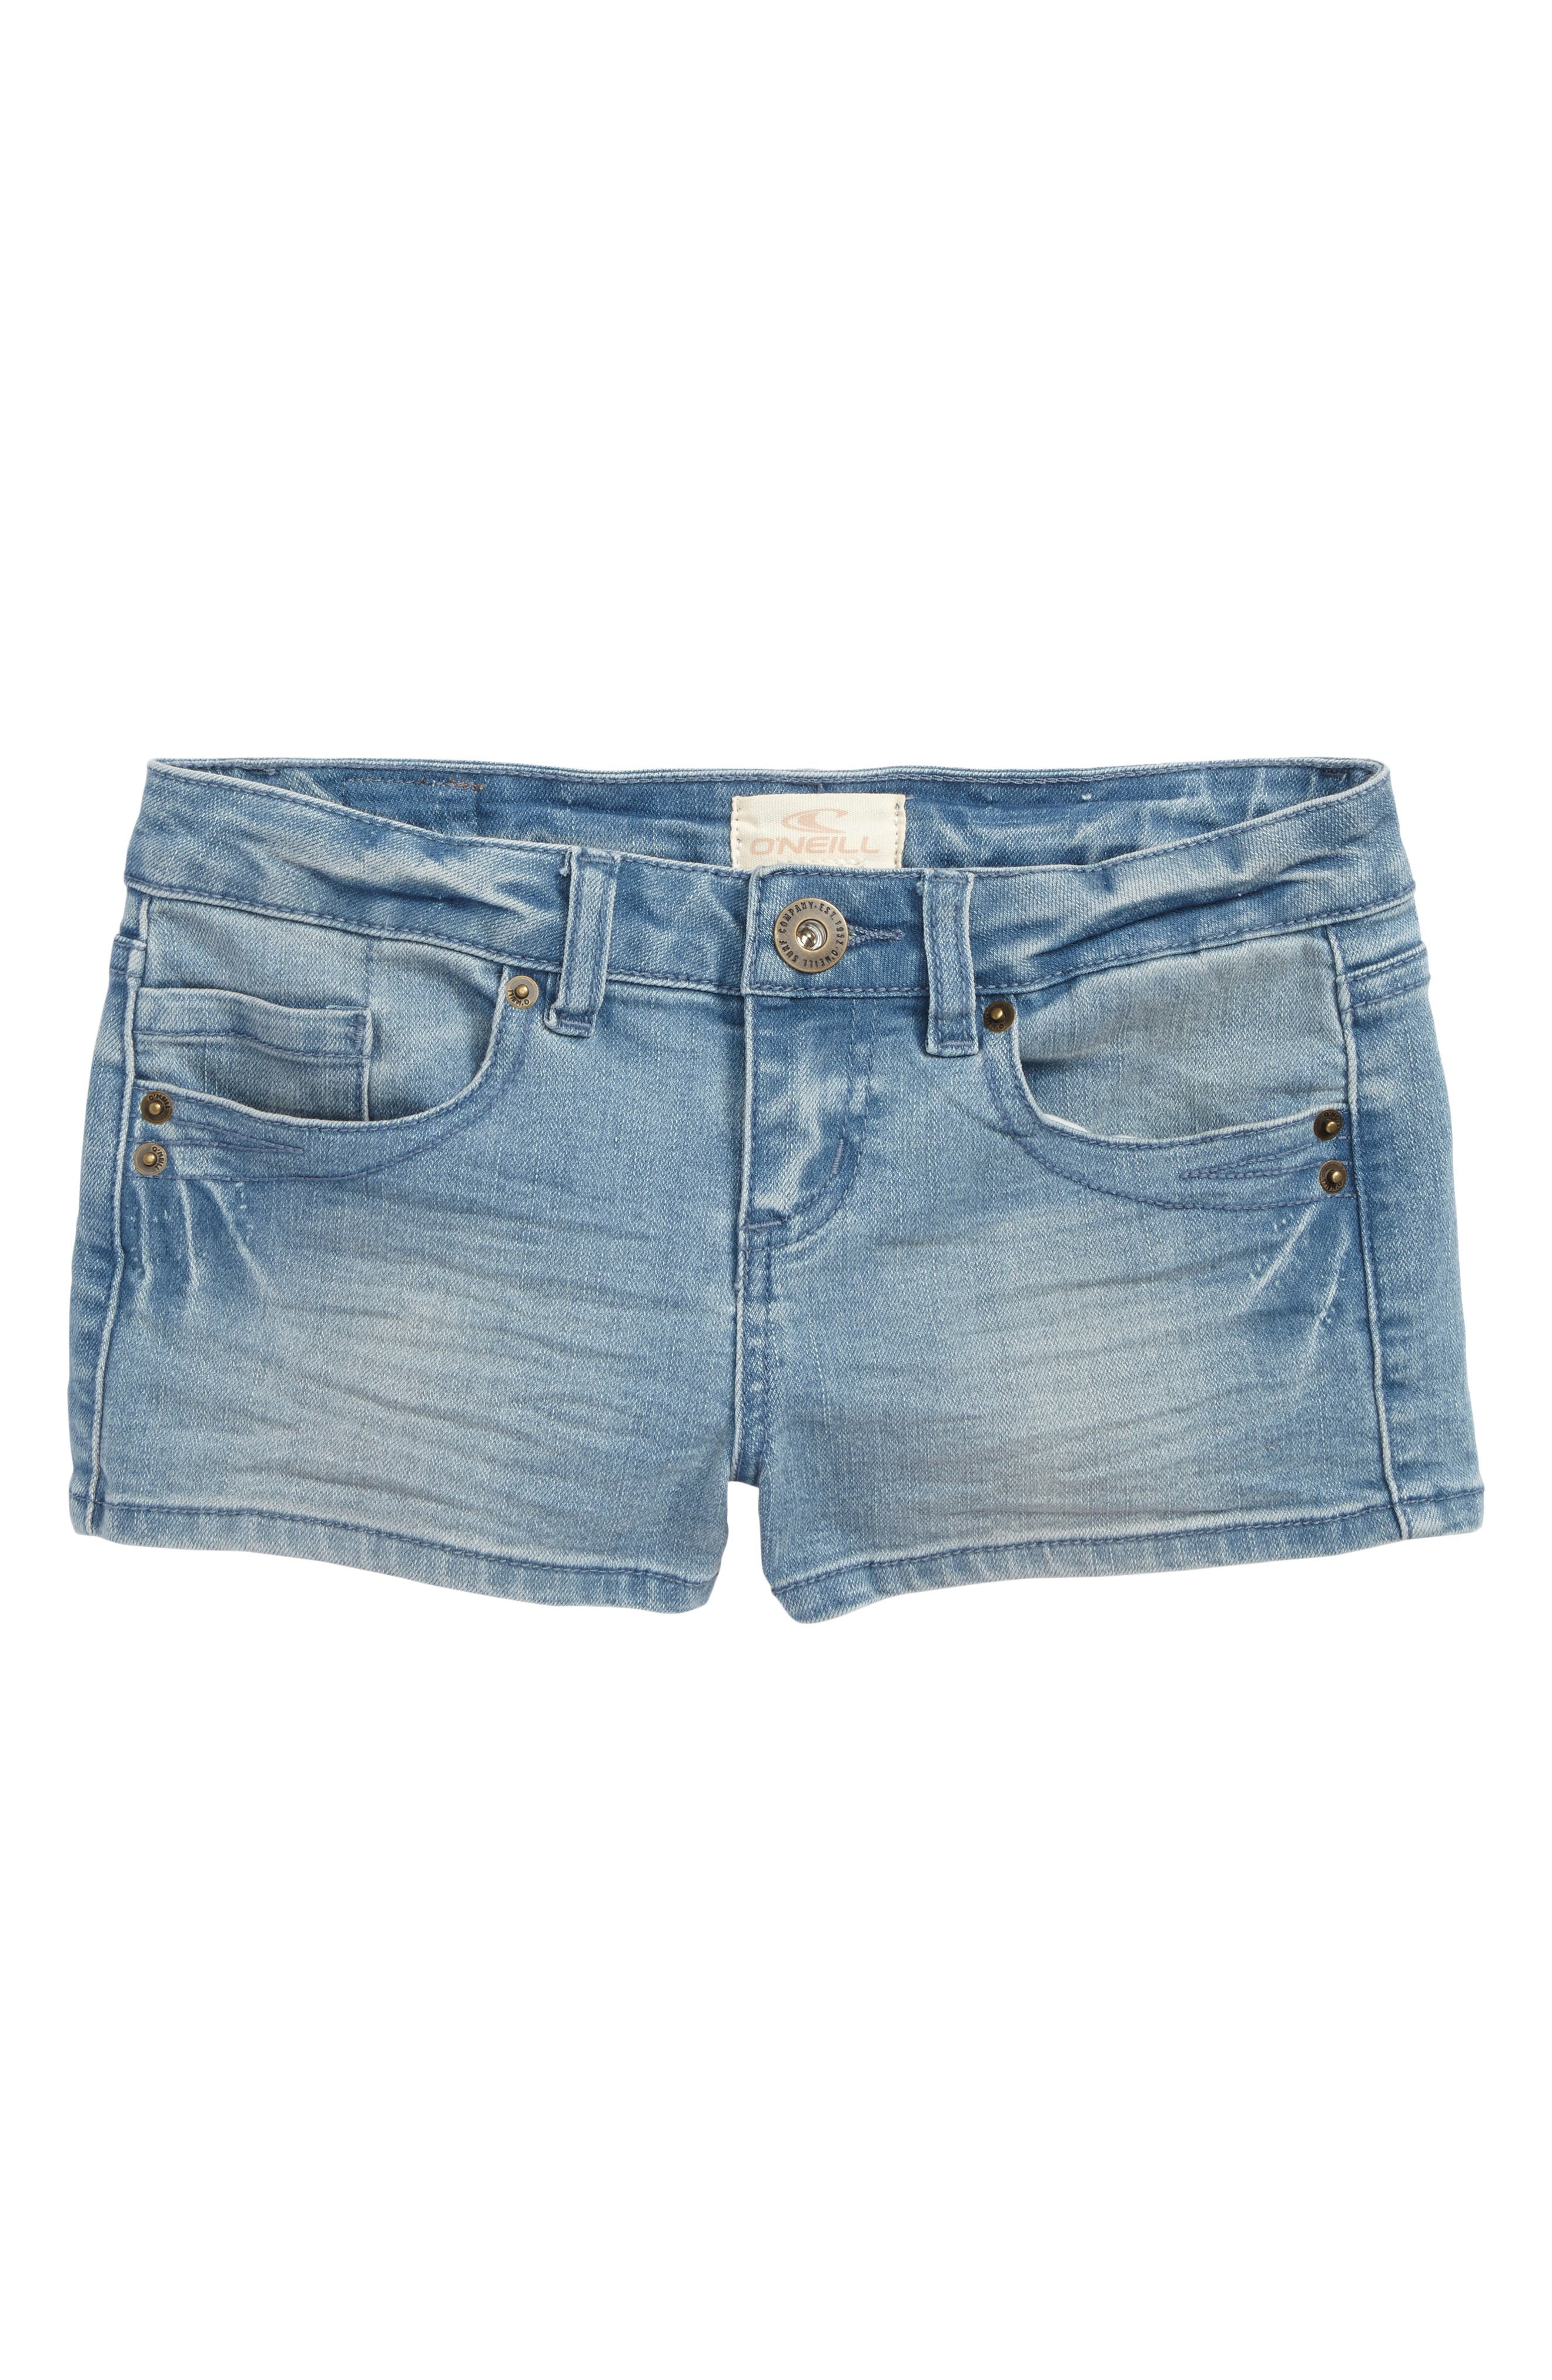 Alternate Image 1 Selected - O'Neiil Waidley Denim Shorts (Big Girls)